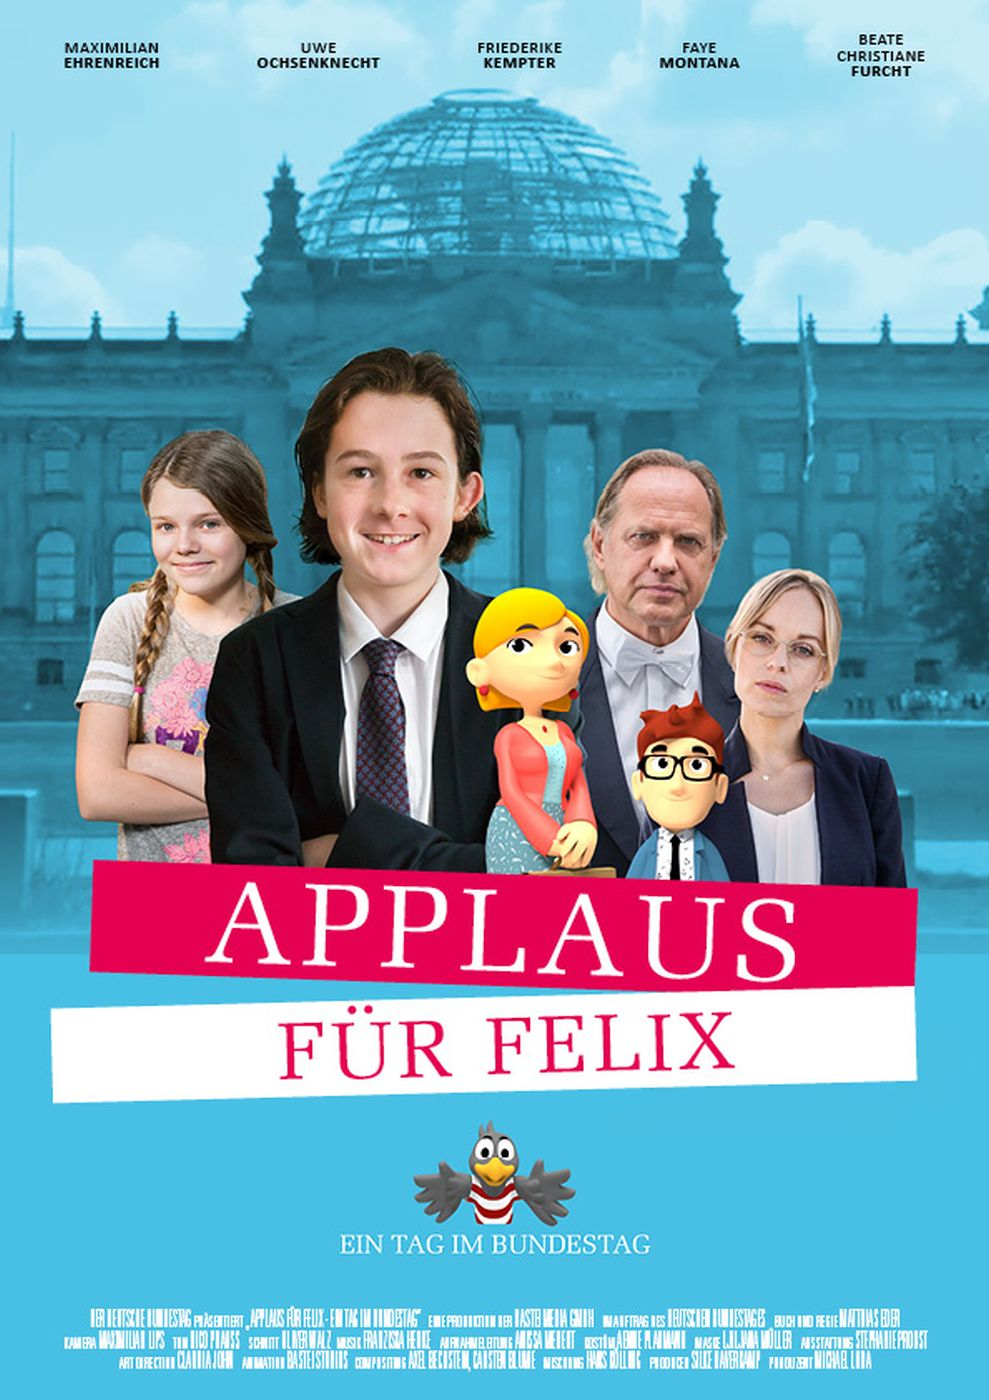 Ein Tag im Bundestag_Franziska Henke_Bastei Media.jpg